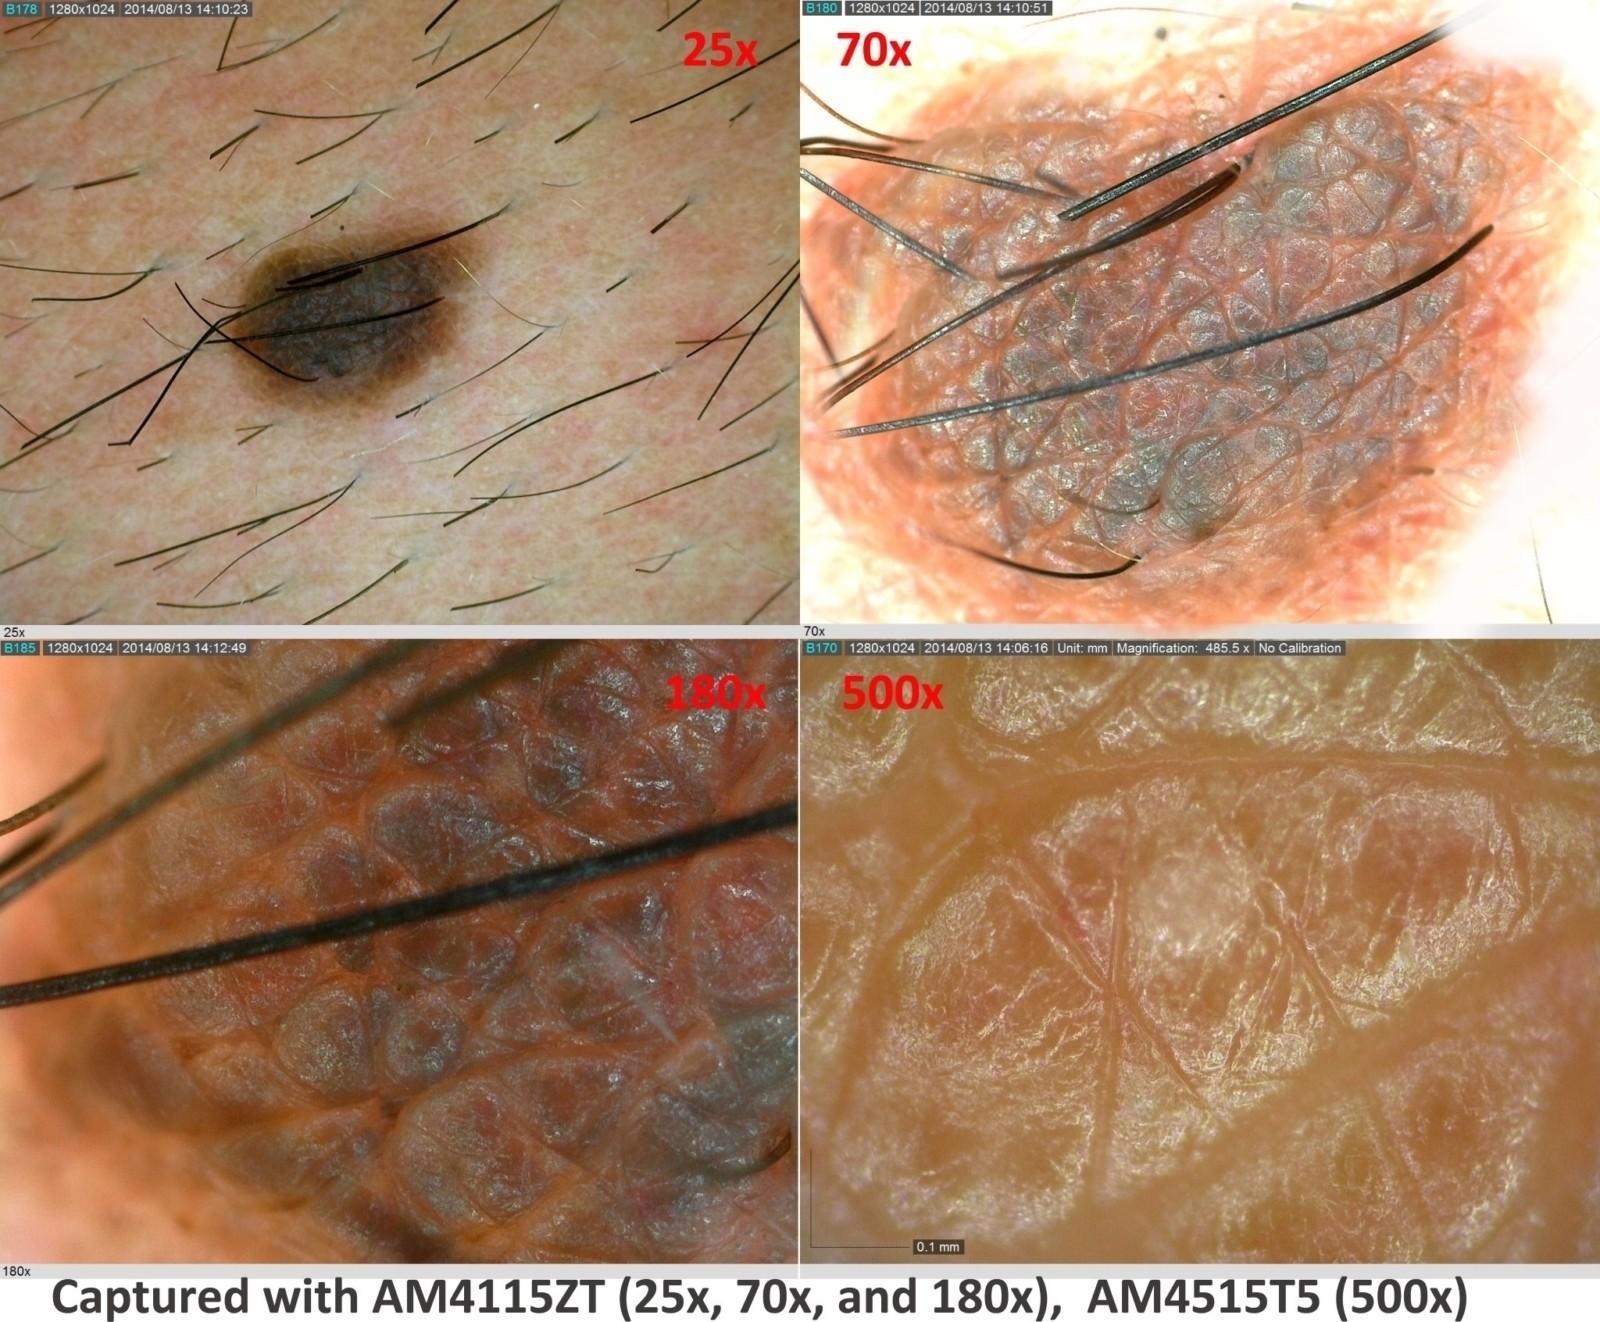 dermatology_10r